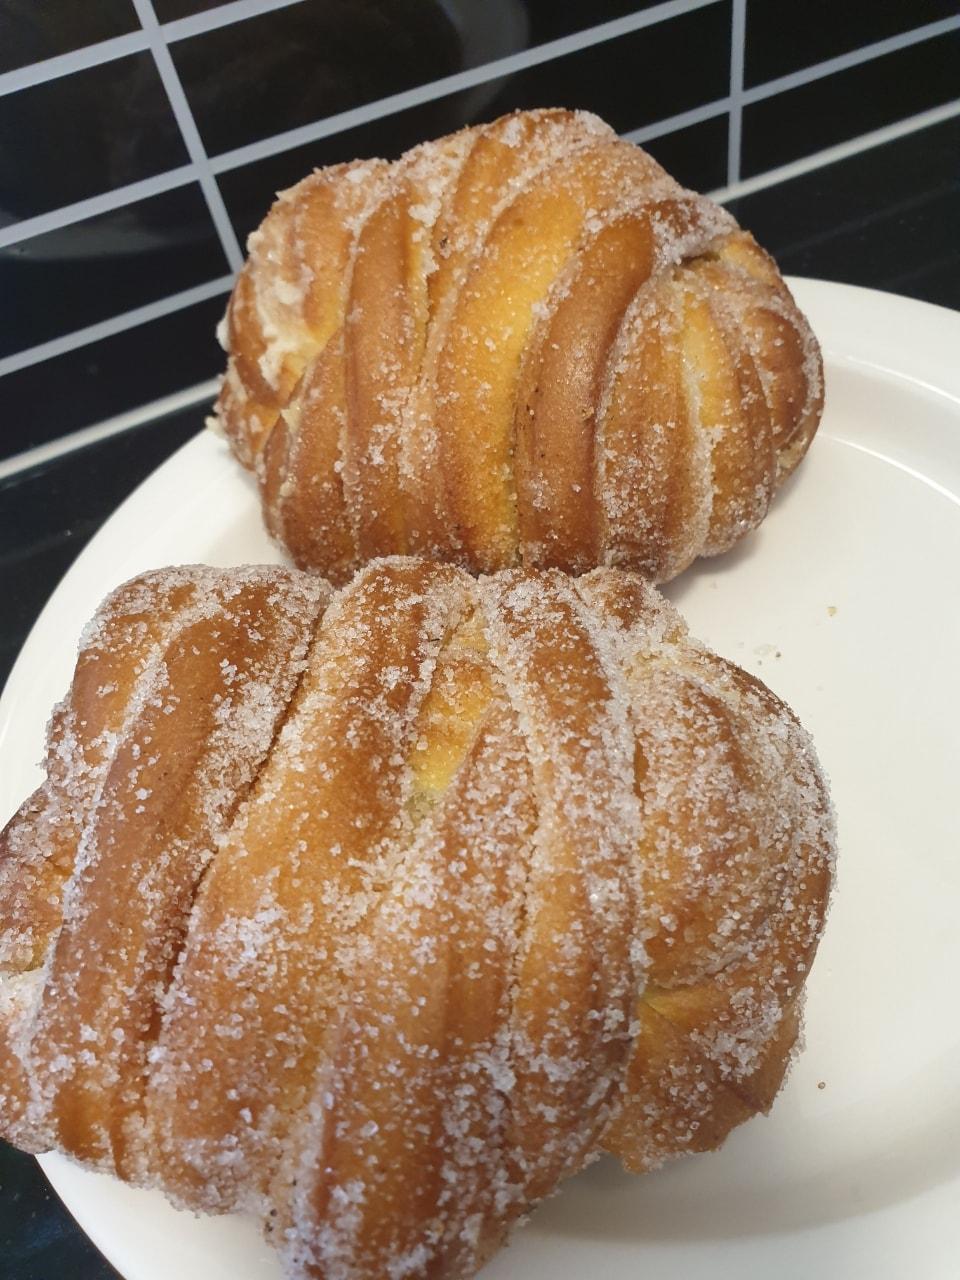 Fresh vanillabuns from lindqvists (14/8) 2 pieces